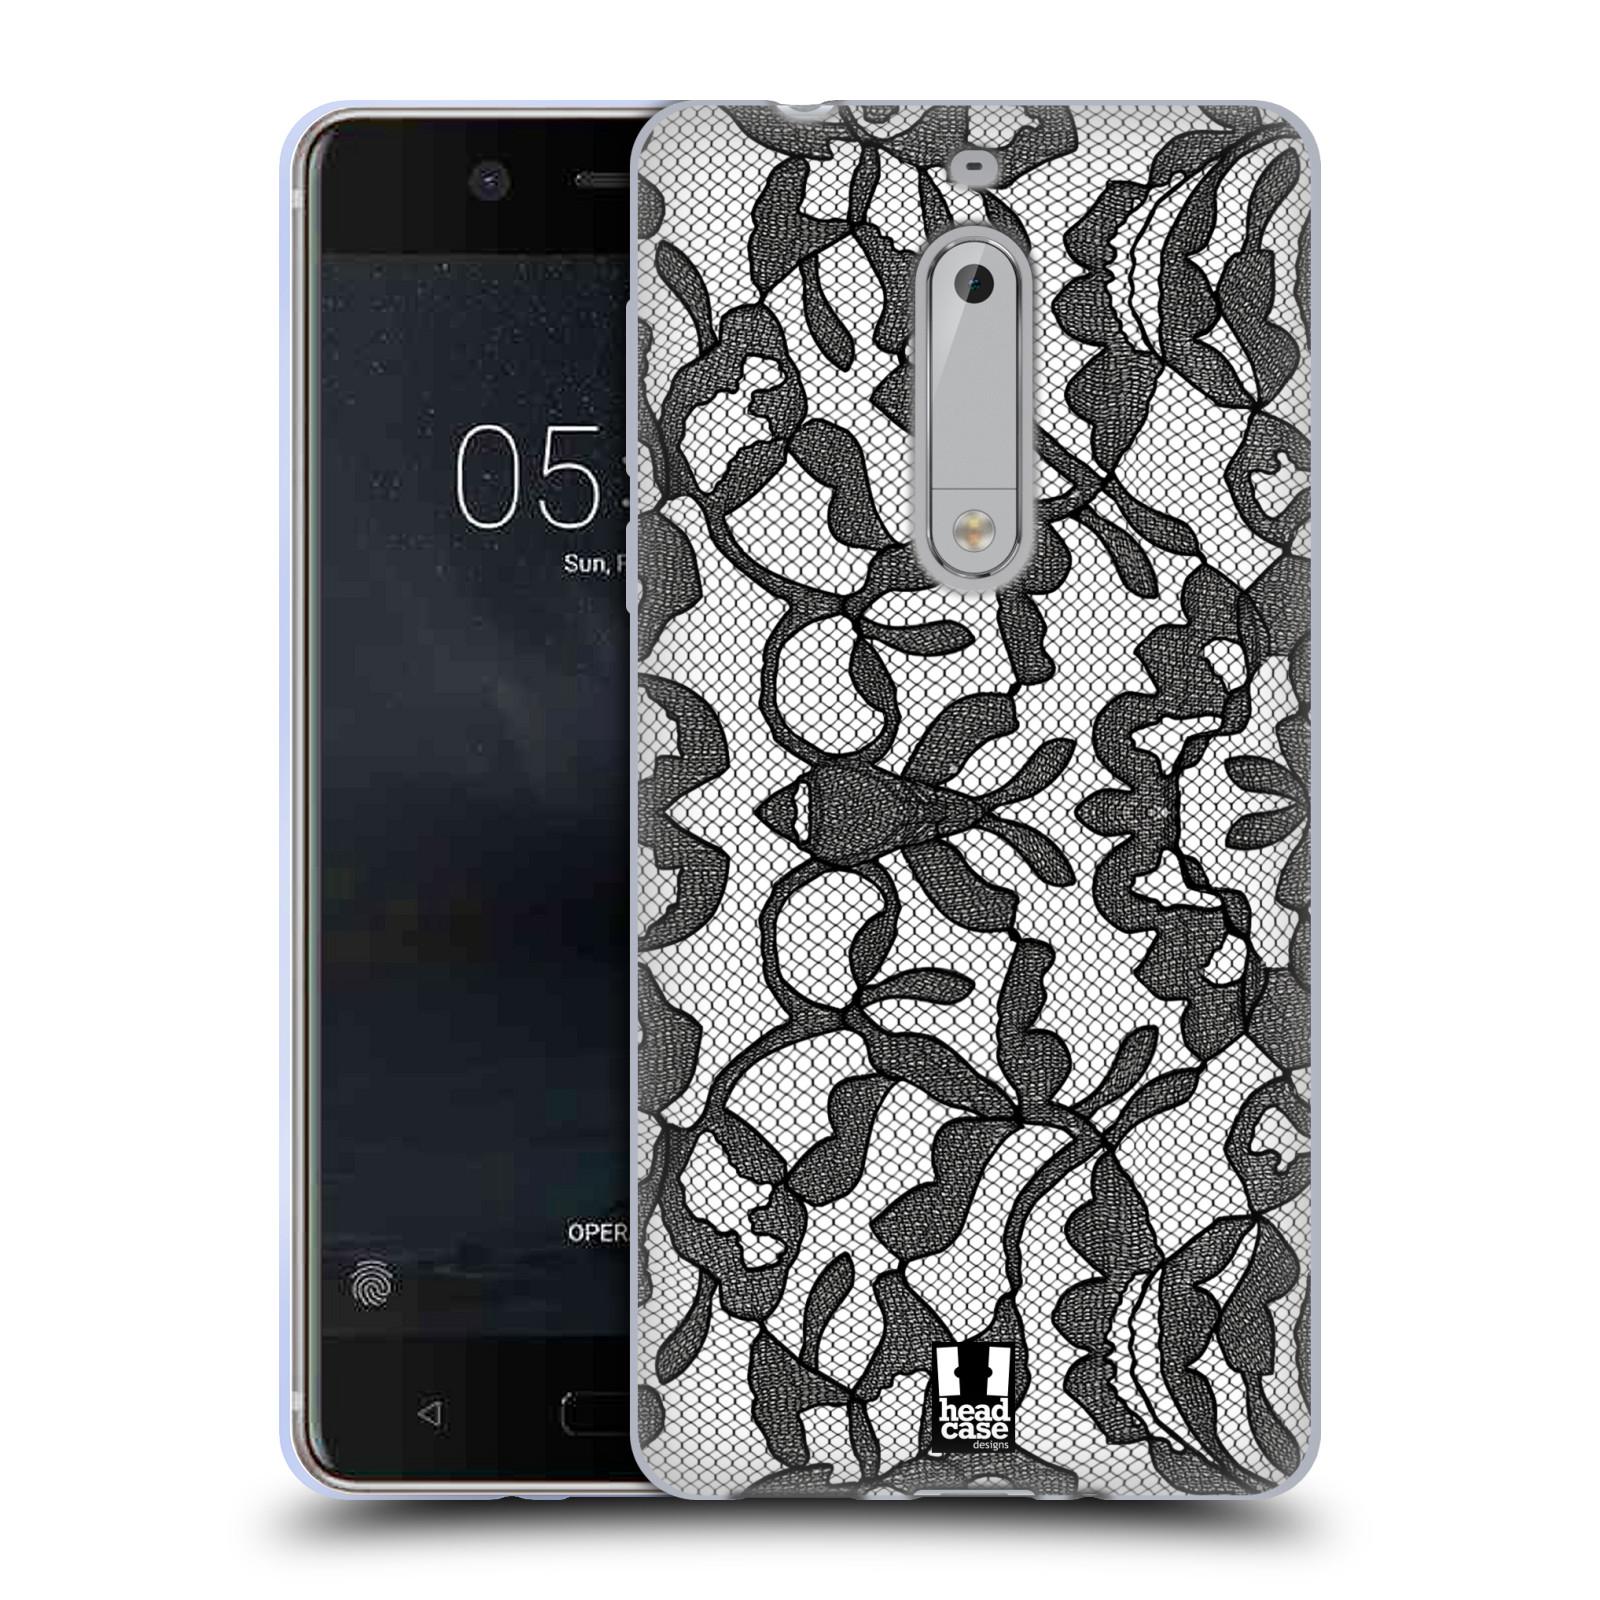 Silikonové pouzdro na mobil Nokia 5 Head Case - LEAFY KRAJKA